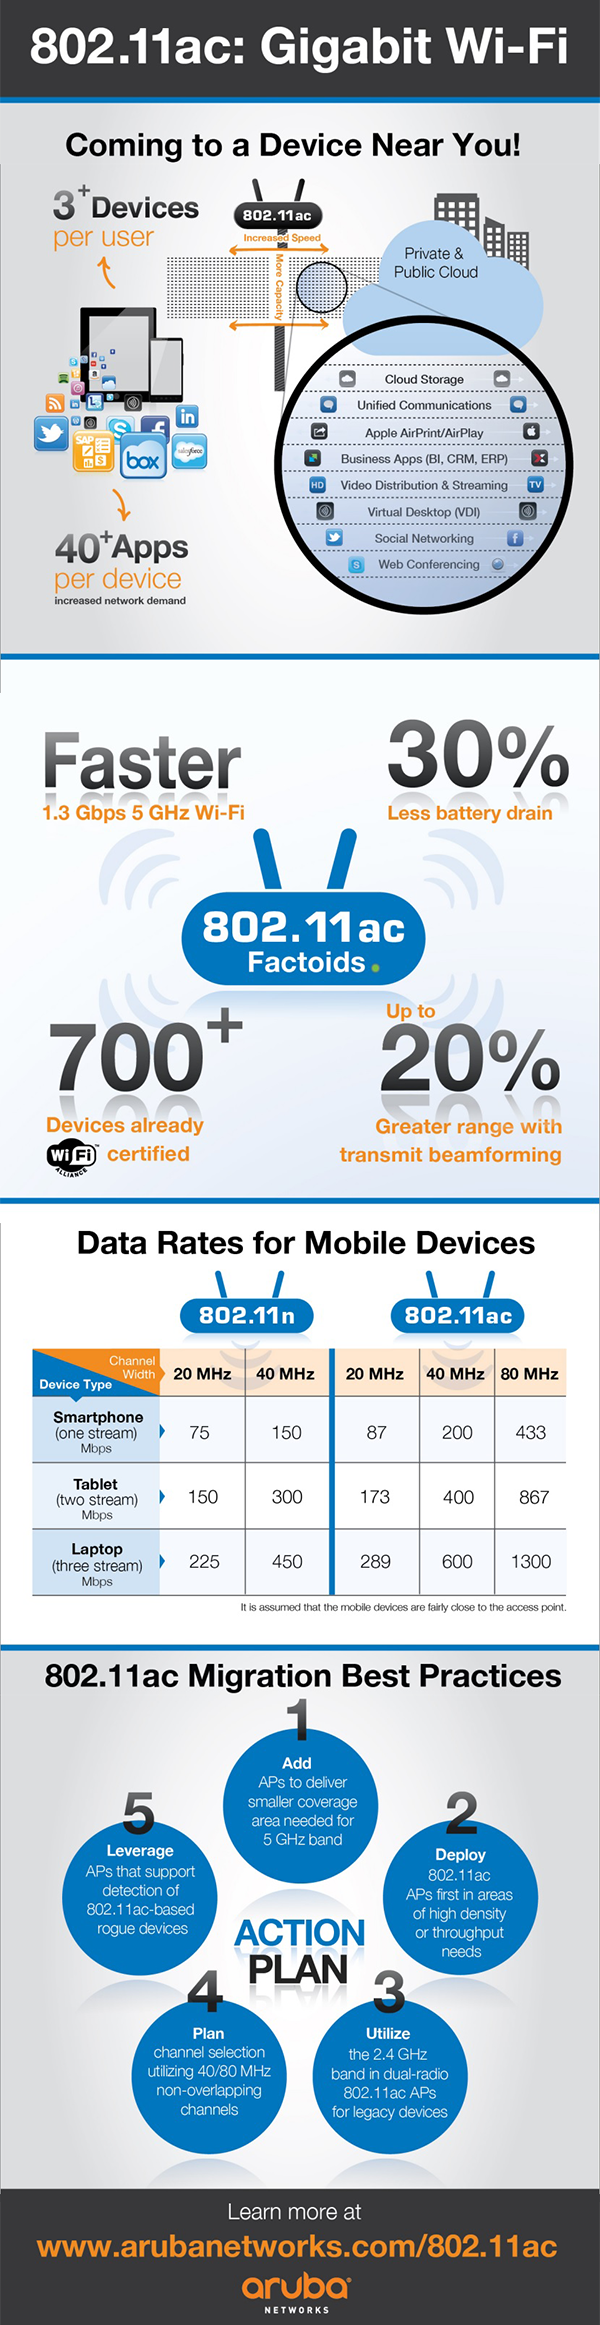 aruba networks 802.11ac infographic for school wireless networks, wifi service providers,